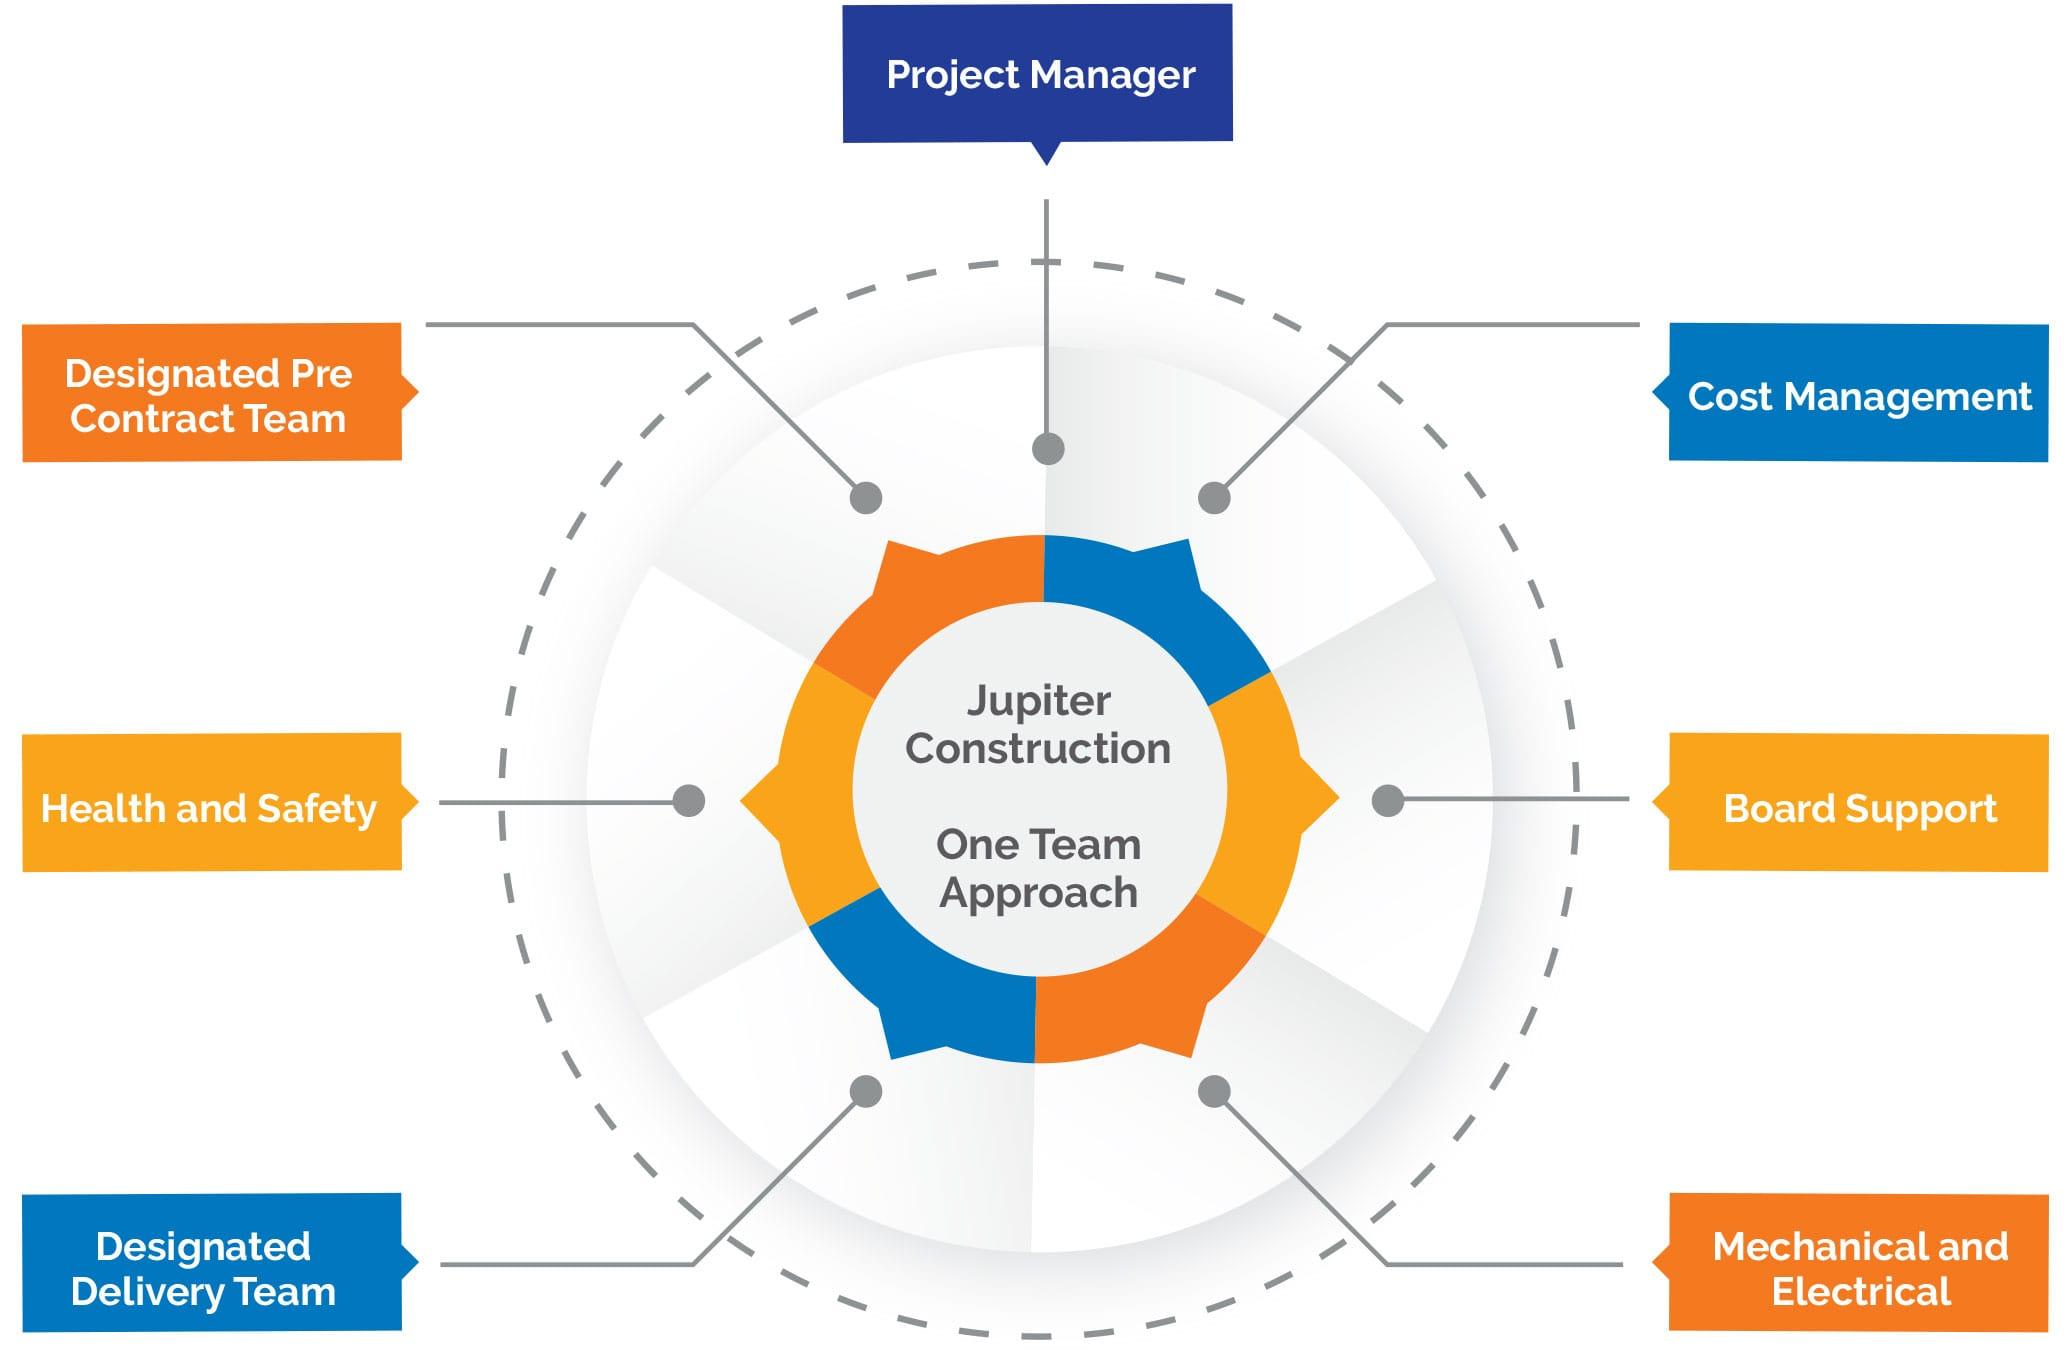 One Team Approach